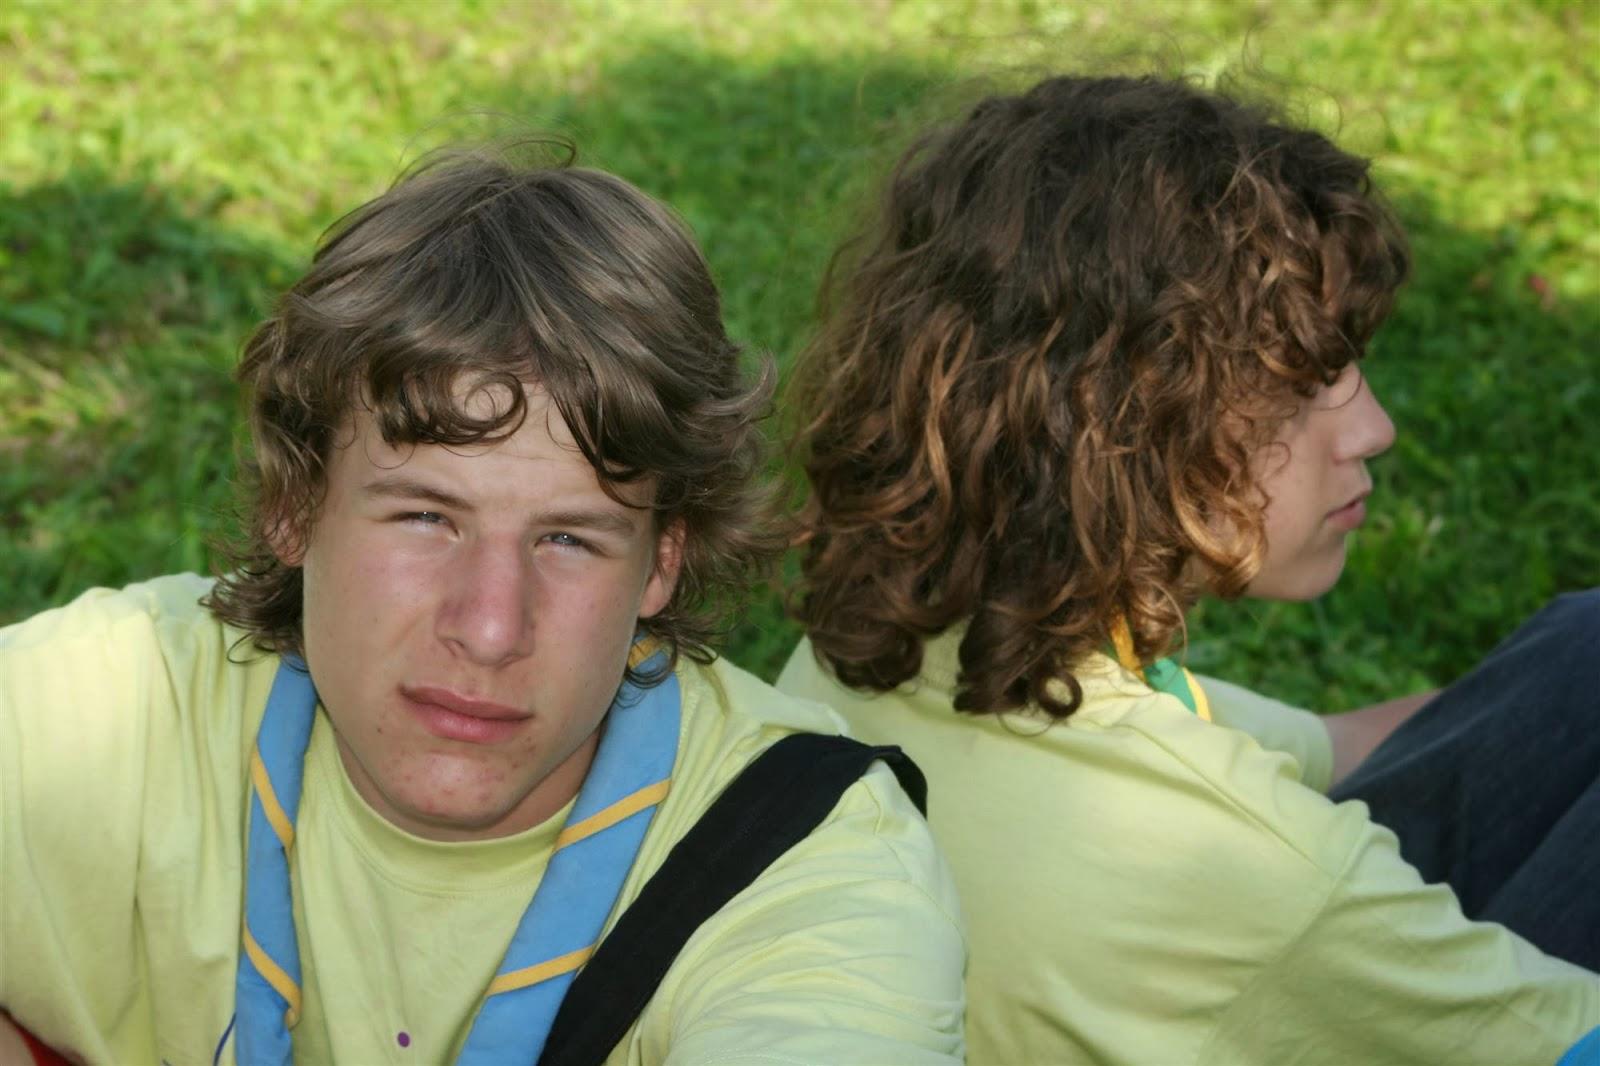 Državni mnogoboj, Velenje 2007 - IMG_8764.jpg